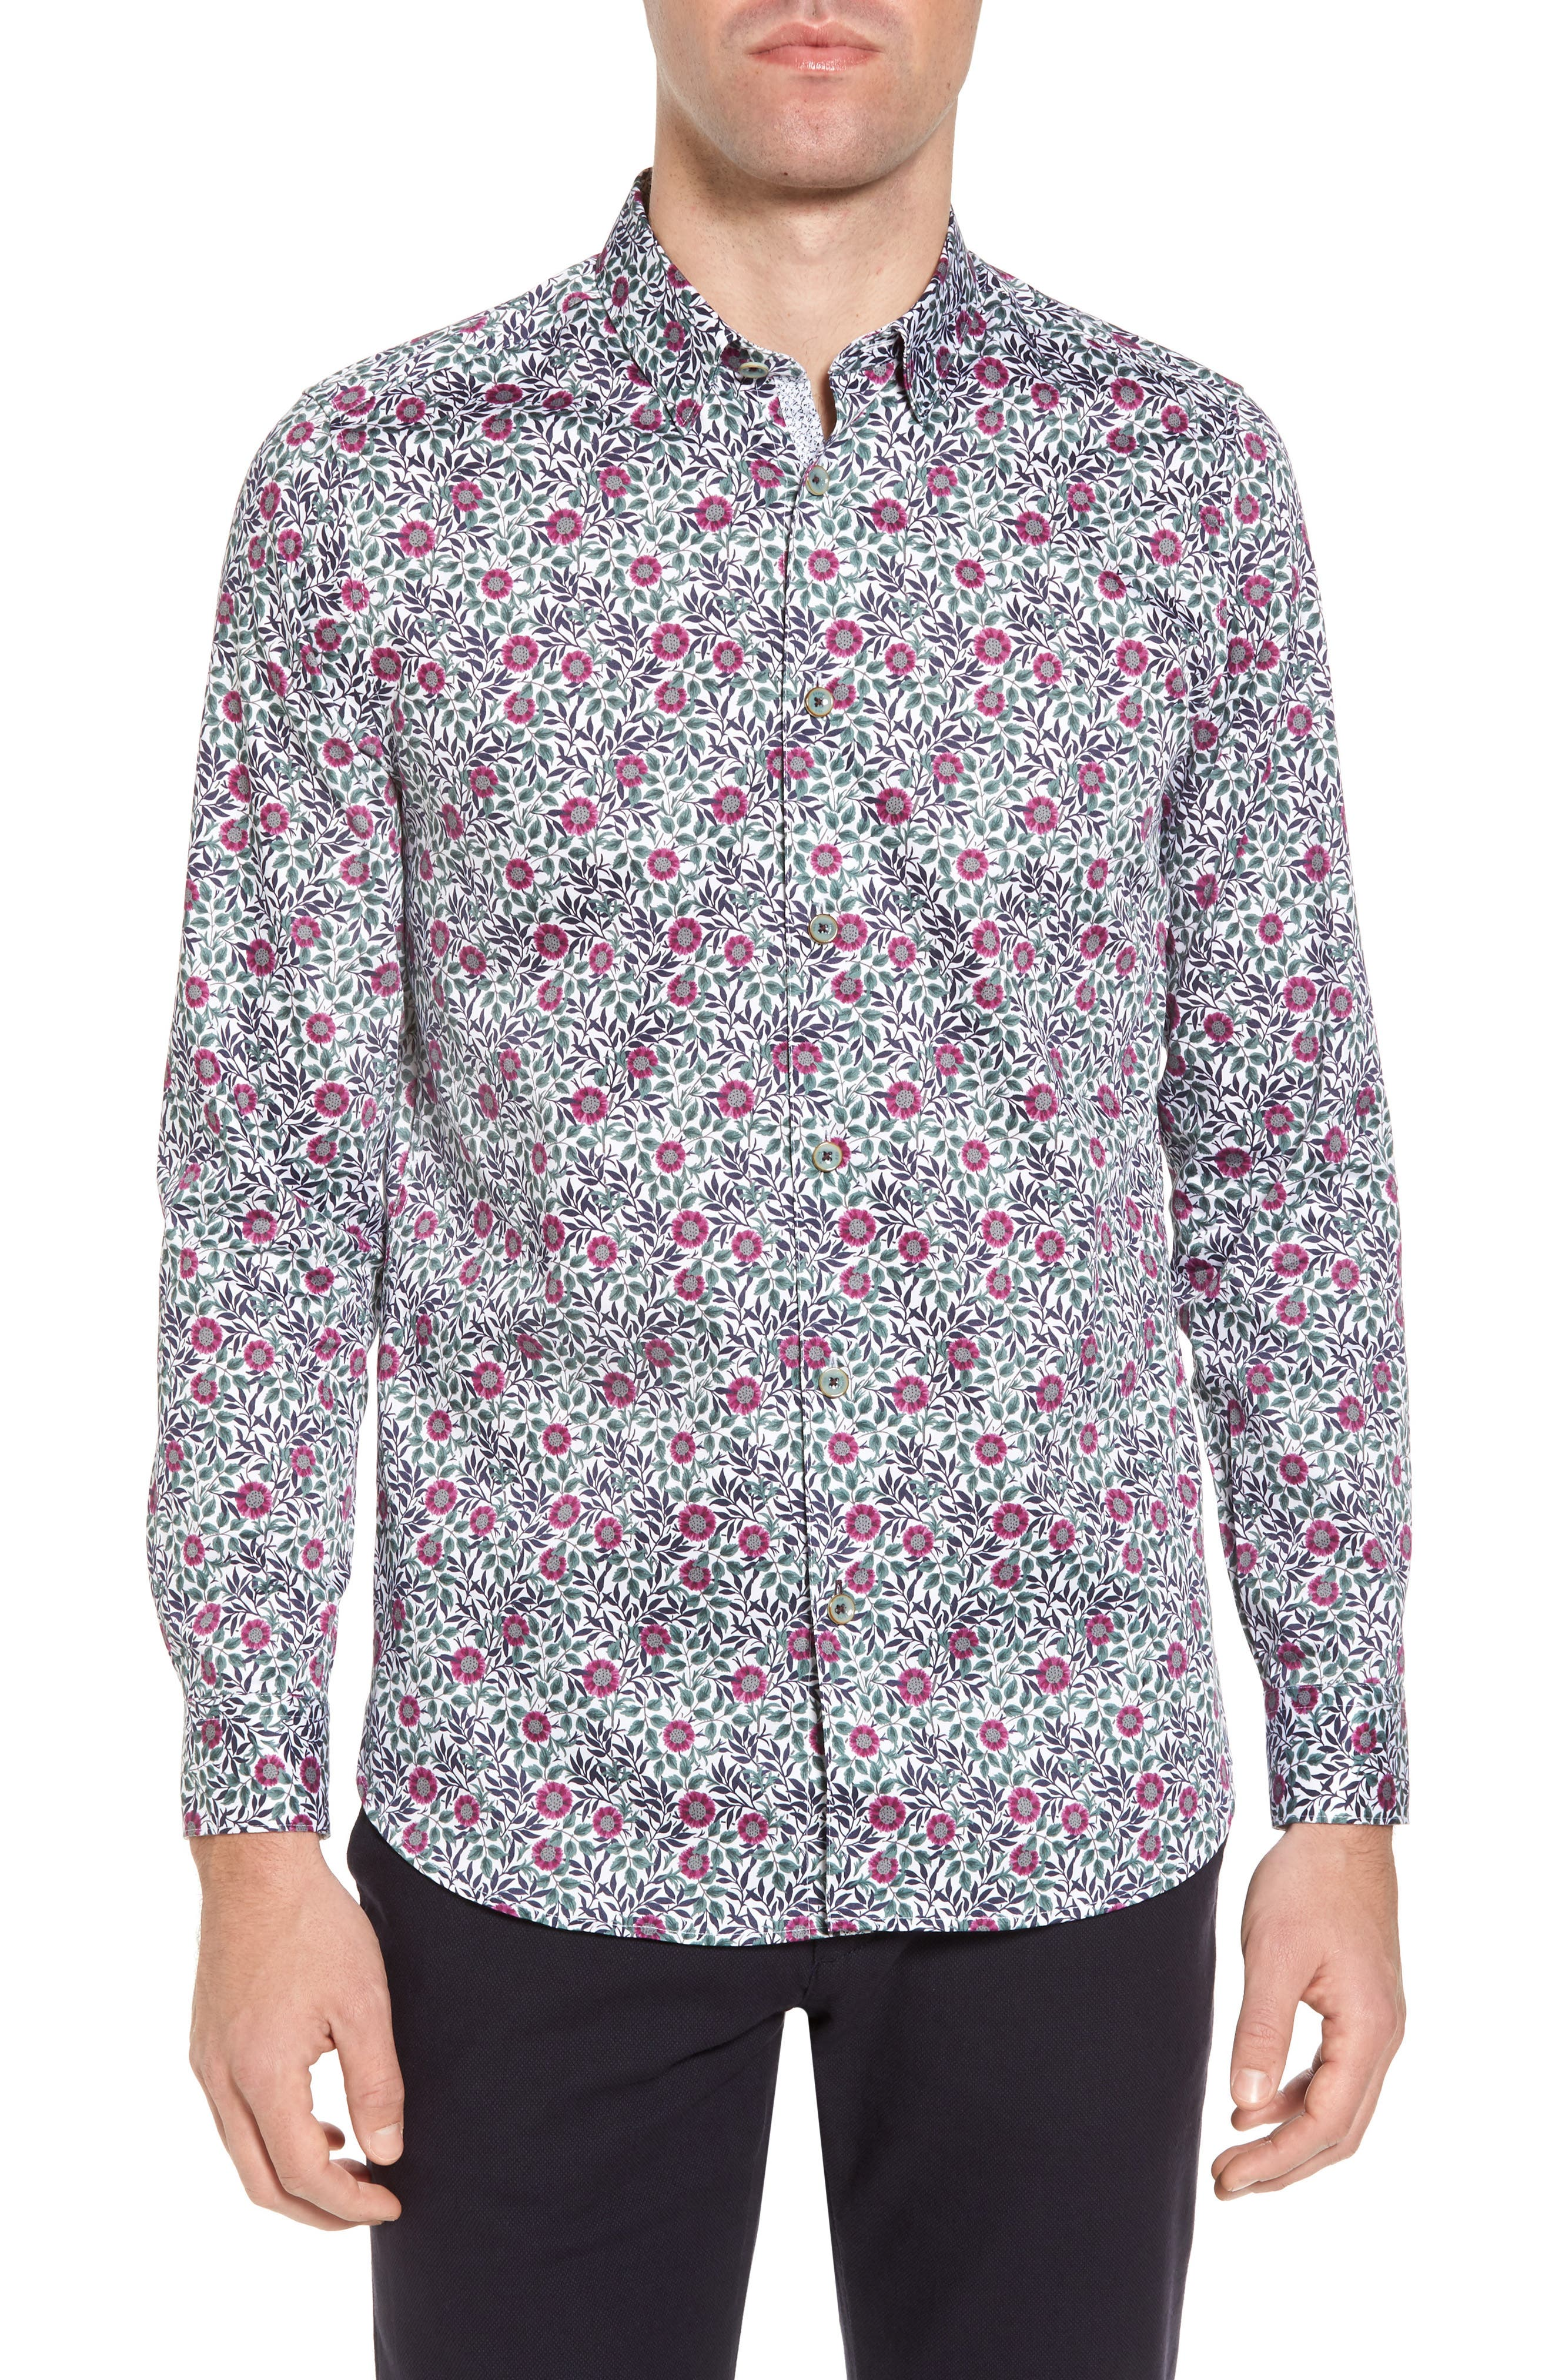 Main Image - Ted Baker London Orense Floral Print Slim Fit Shirt